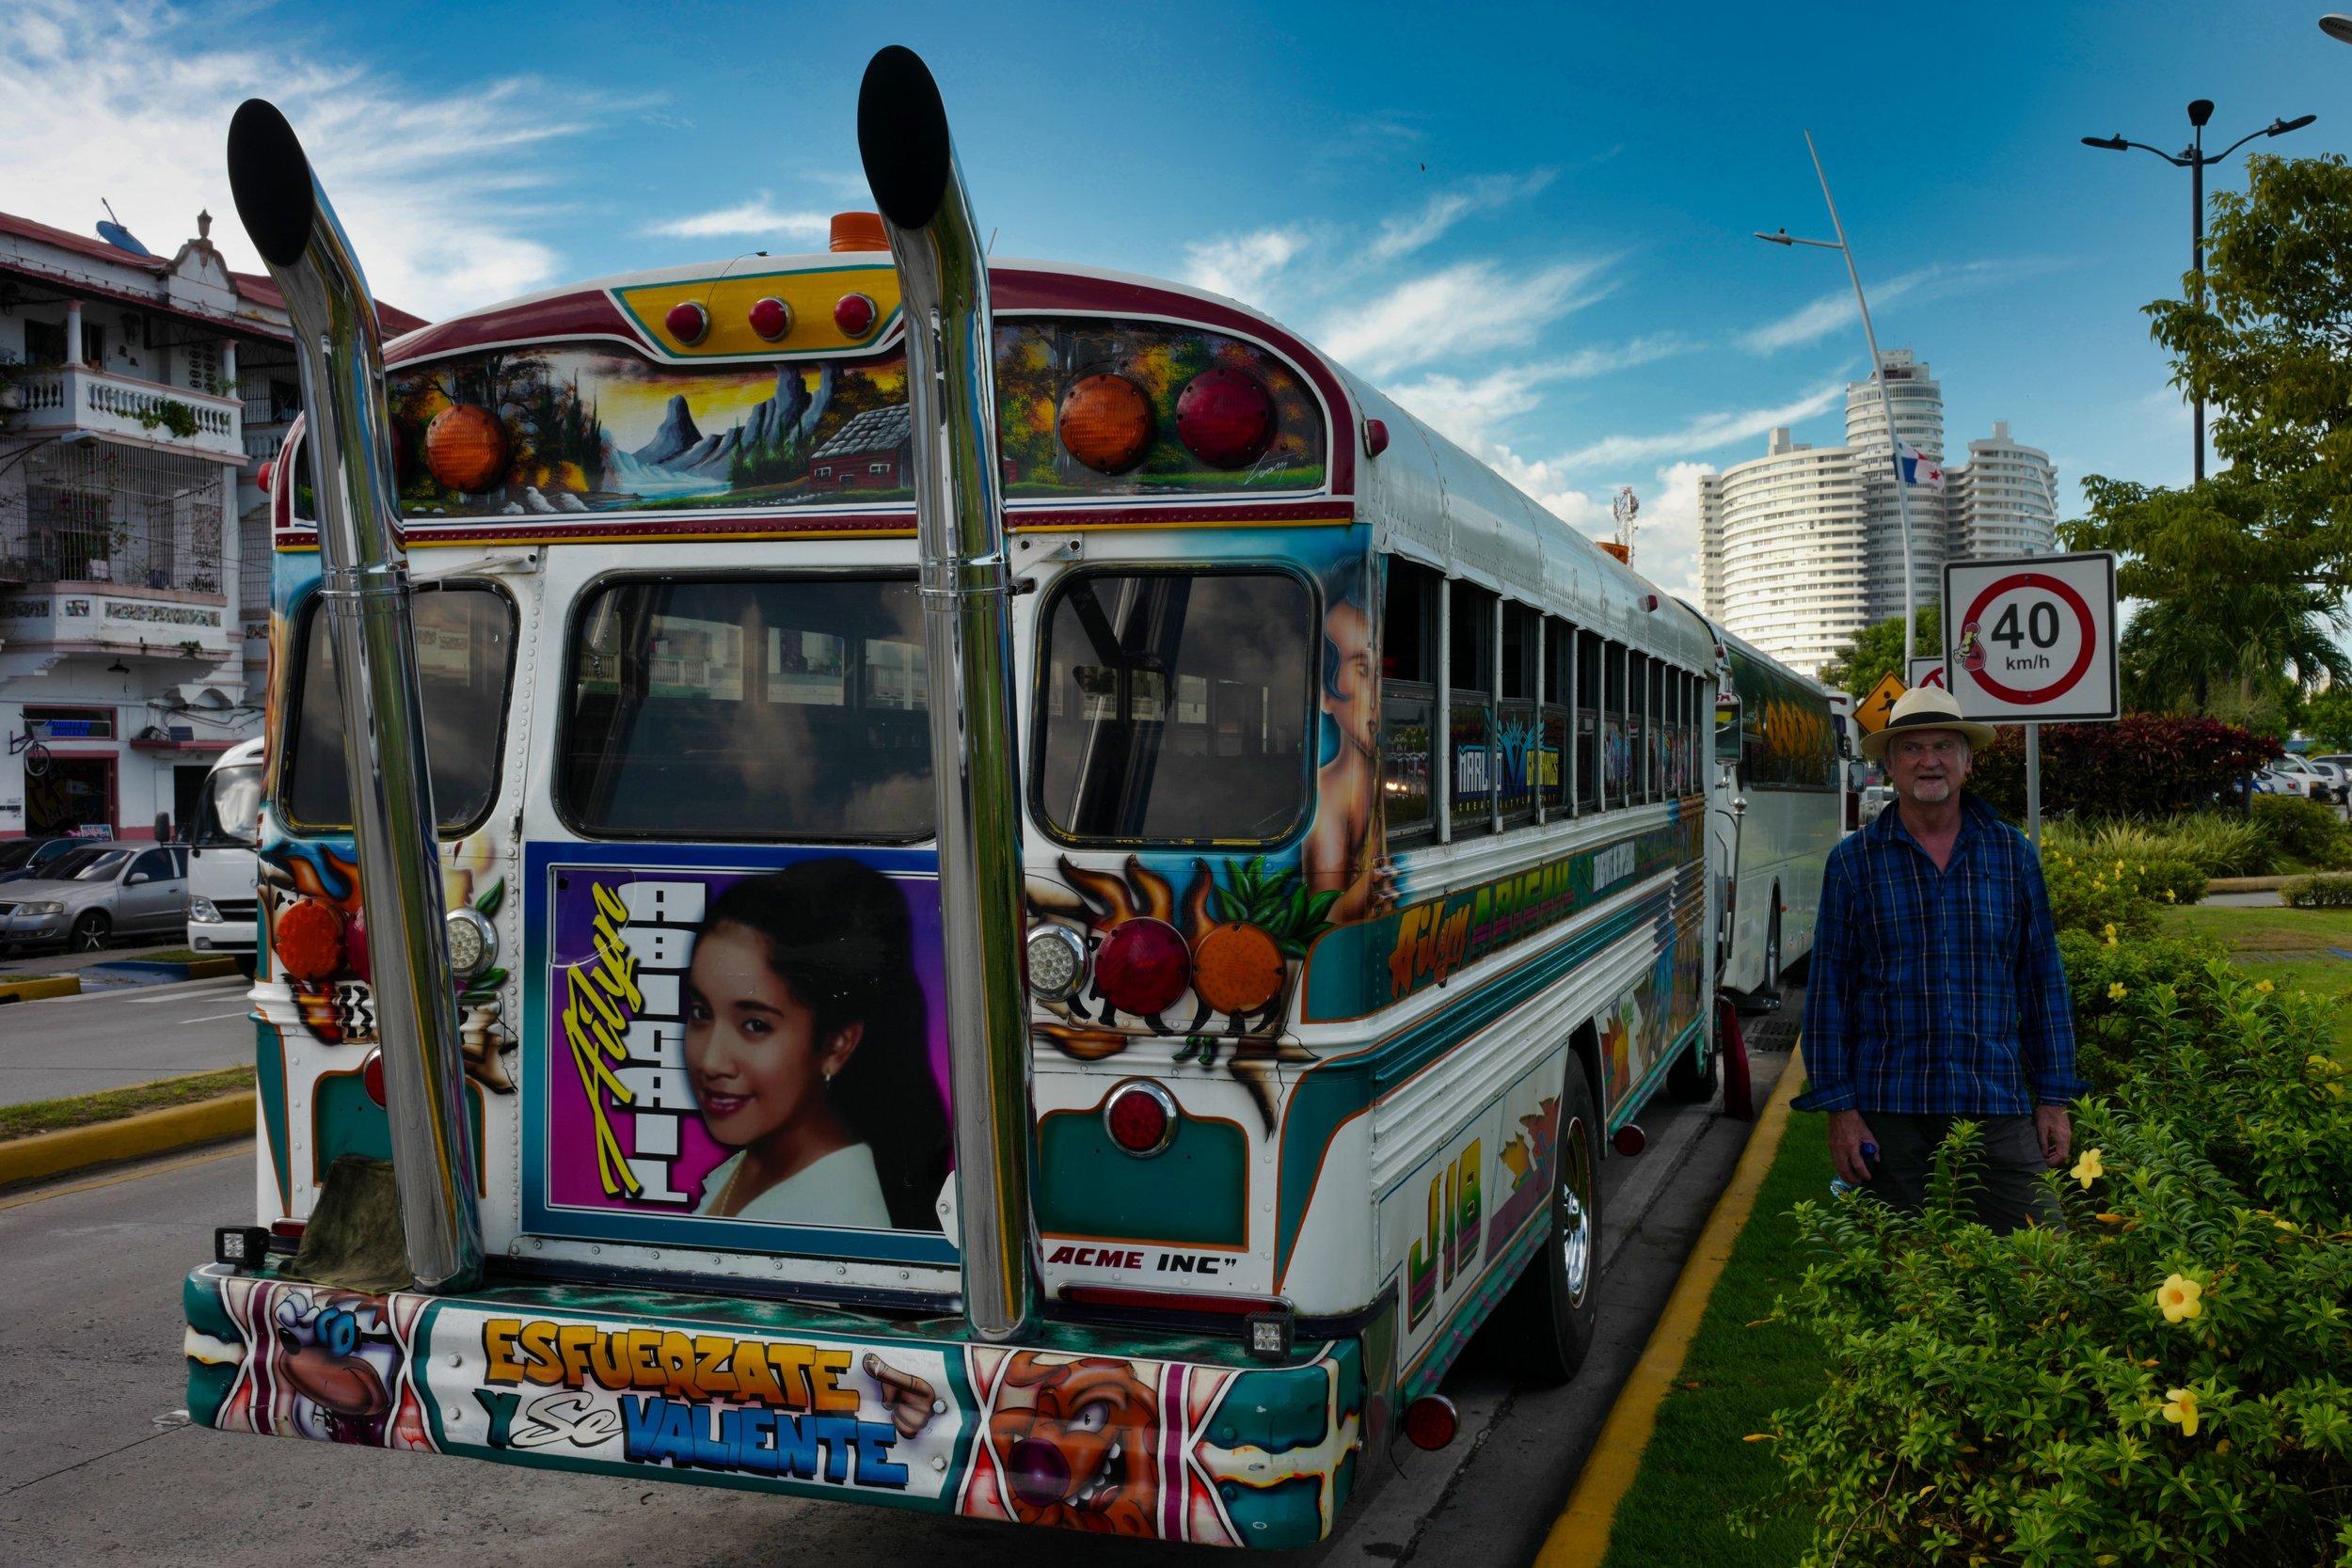 My Bus Panama City, Panama Leica SL 35mm f/1.4 FLE Summilux © Keith R. Sbiral, 2018